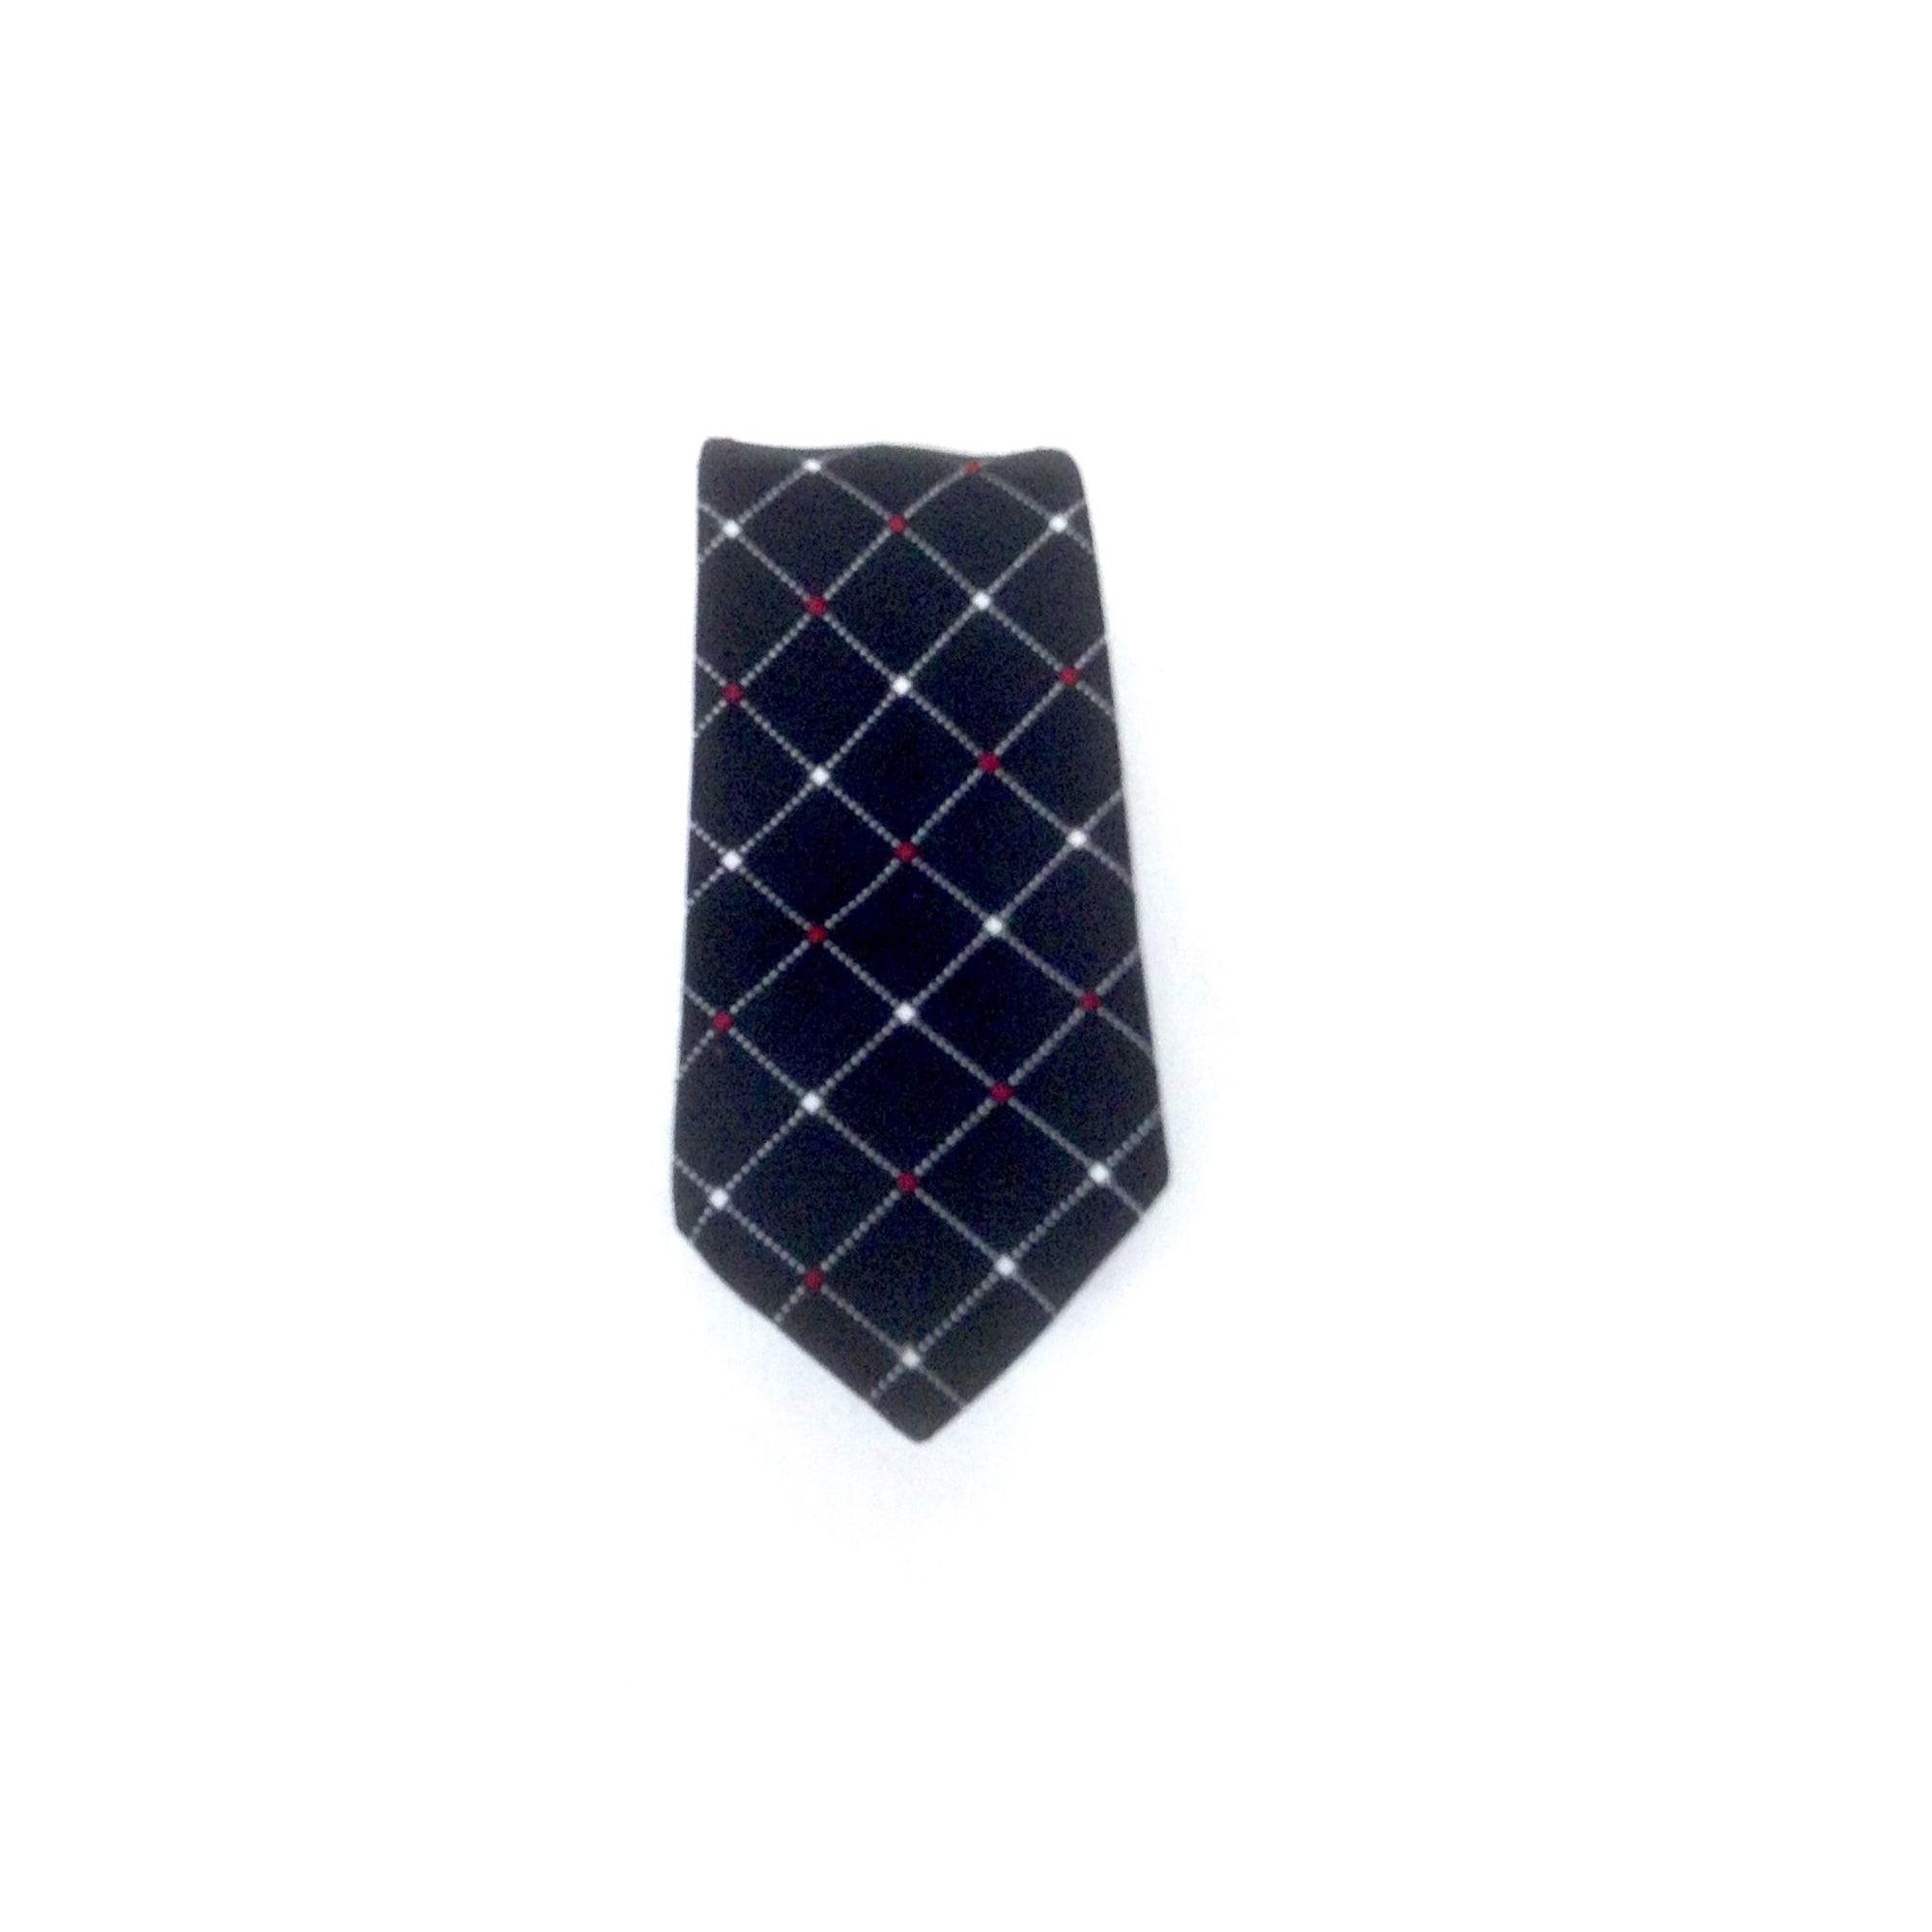 Cravate MARKS & SPENCER Noir